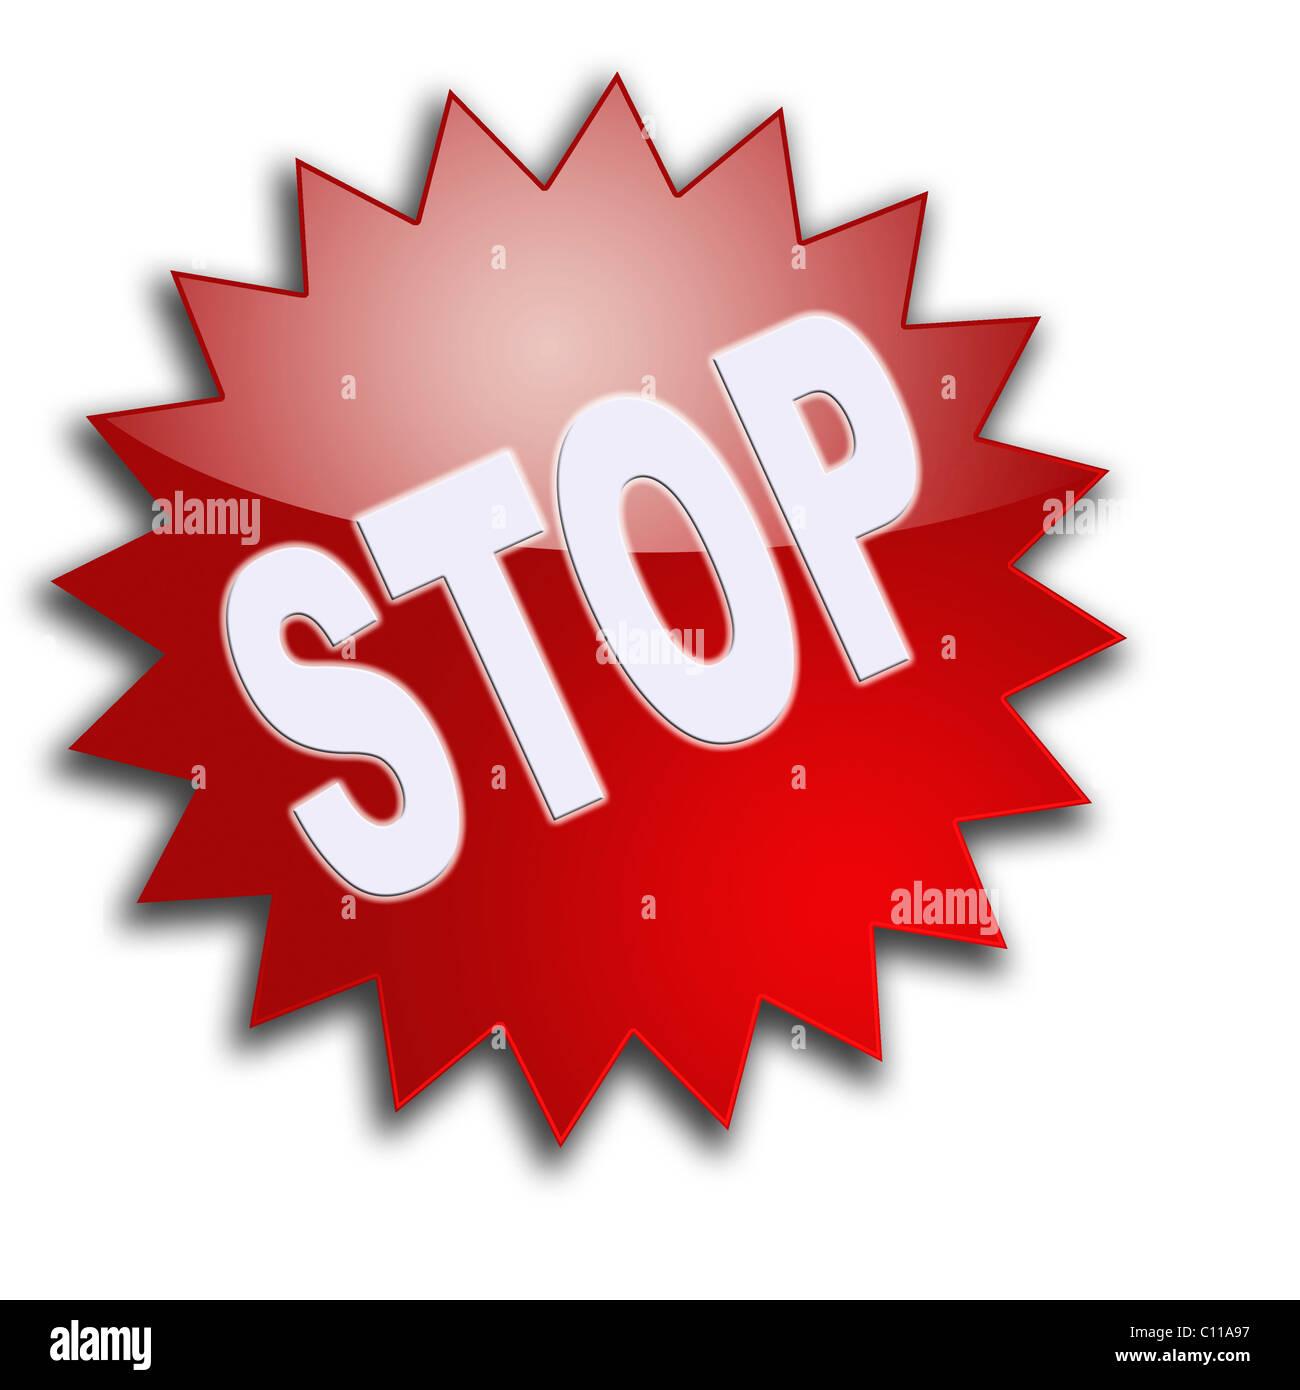 Writing 'Stop' - Stock Image